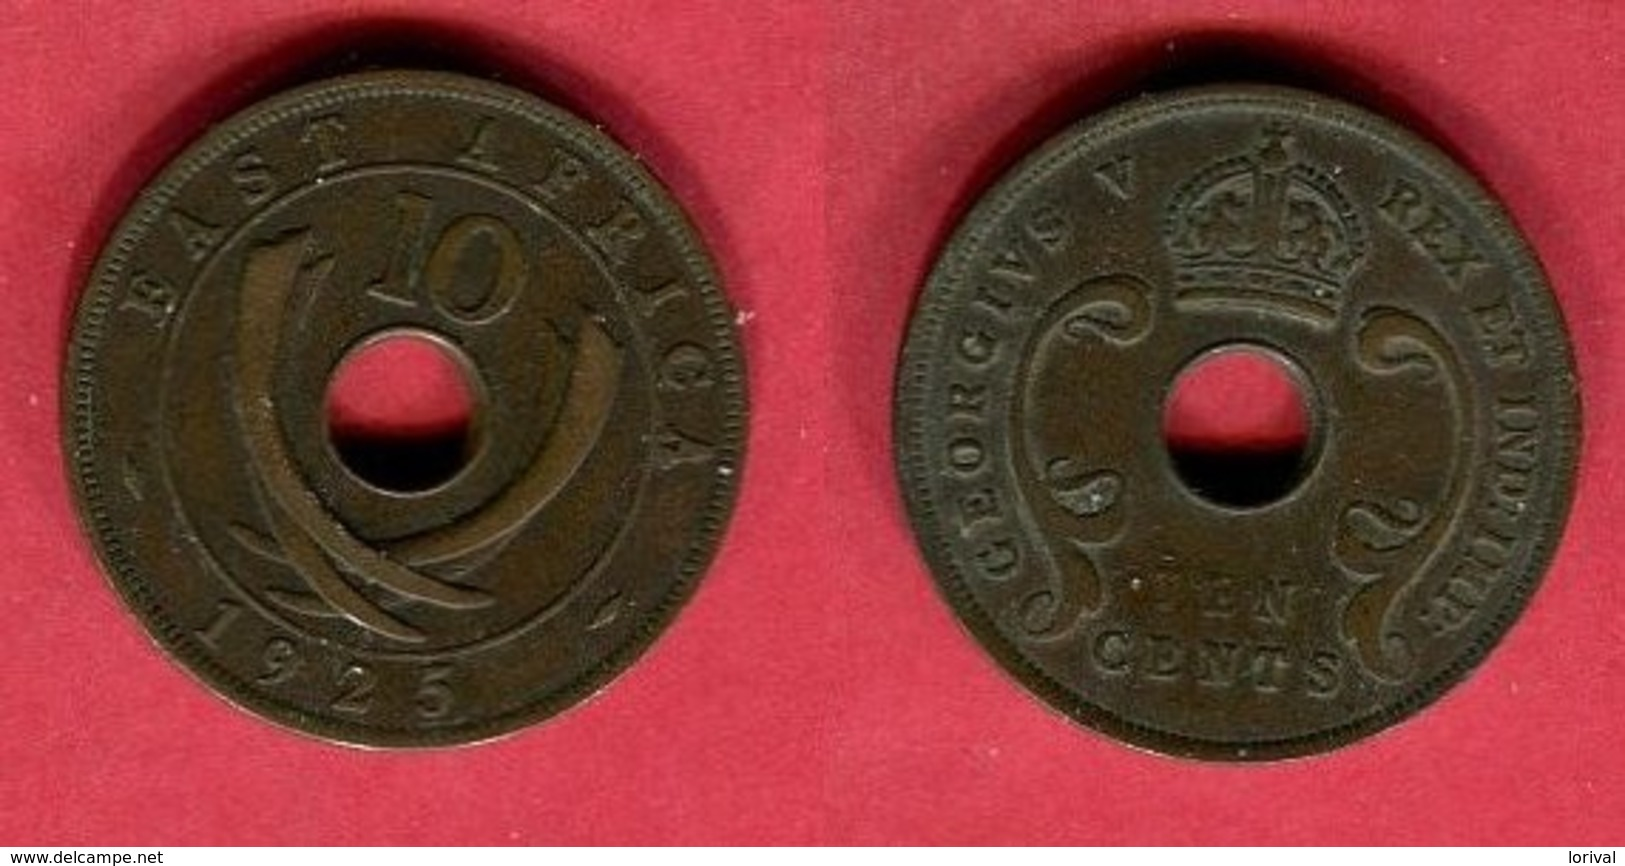 10 CENTS (KM 19 ) TB 3 - British Colony